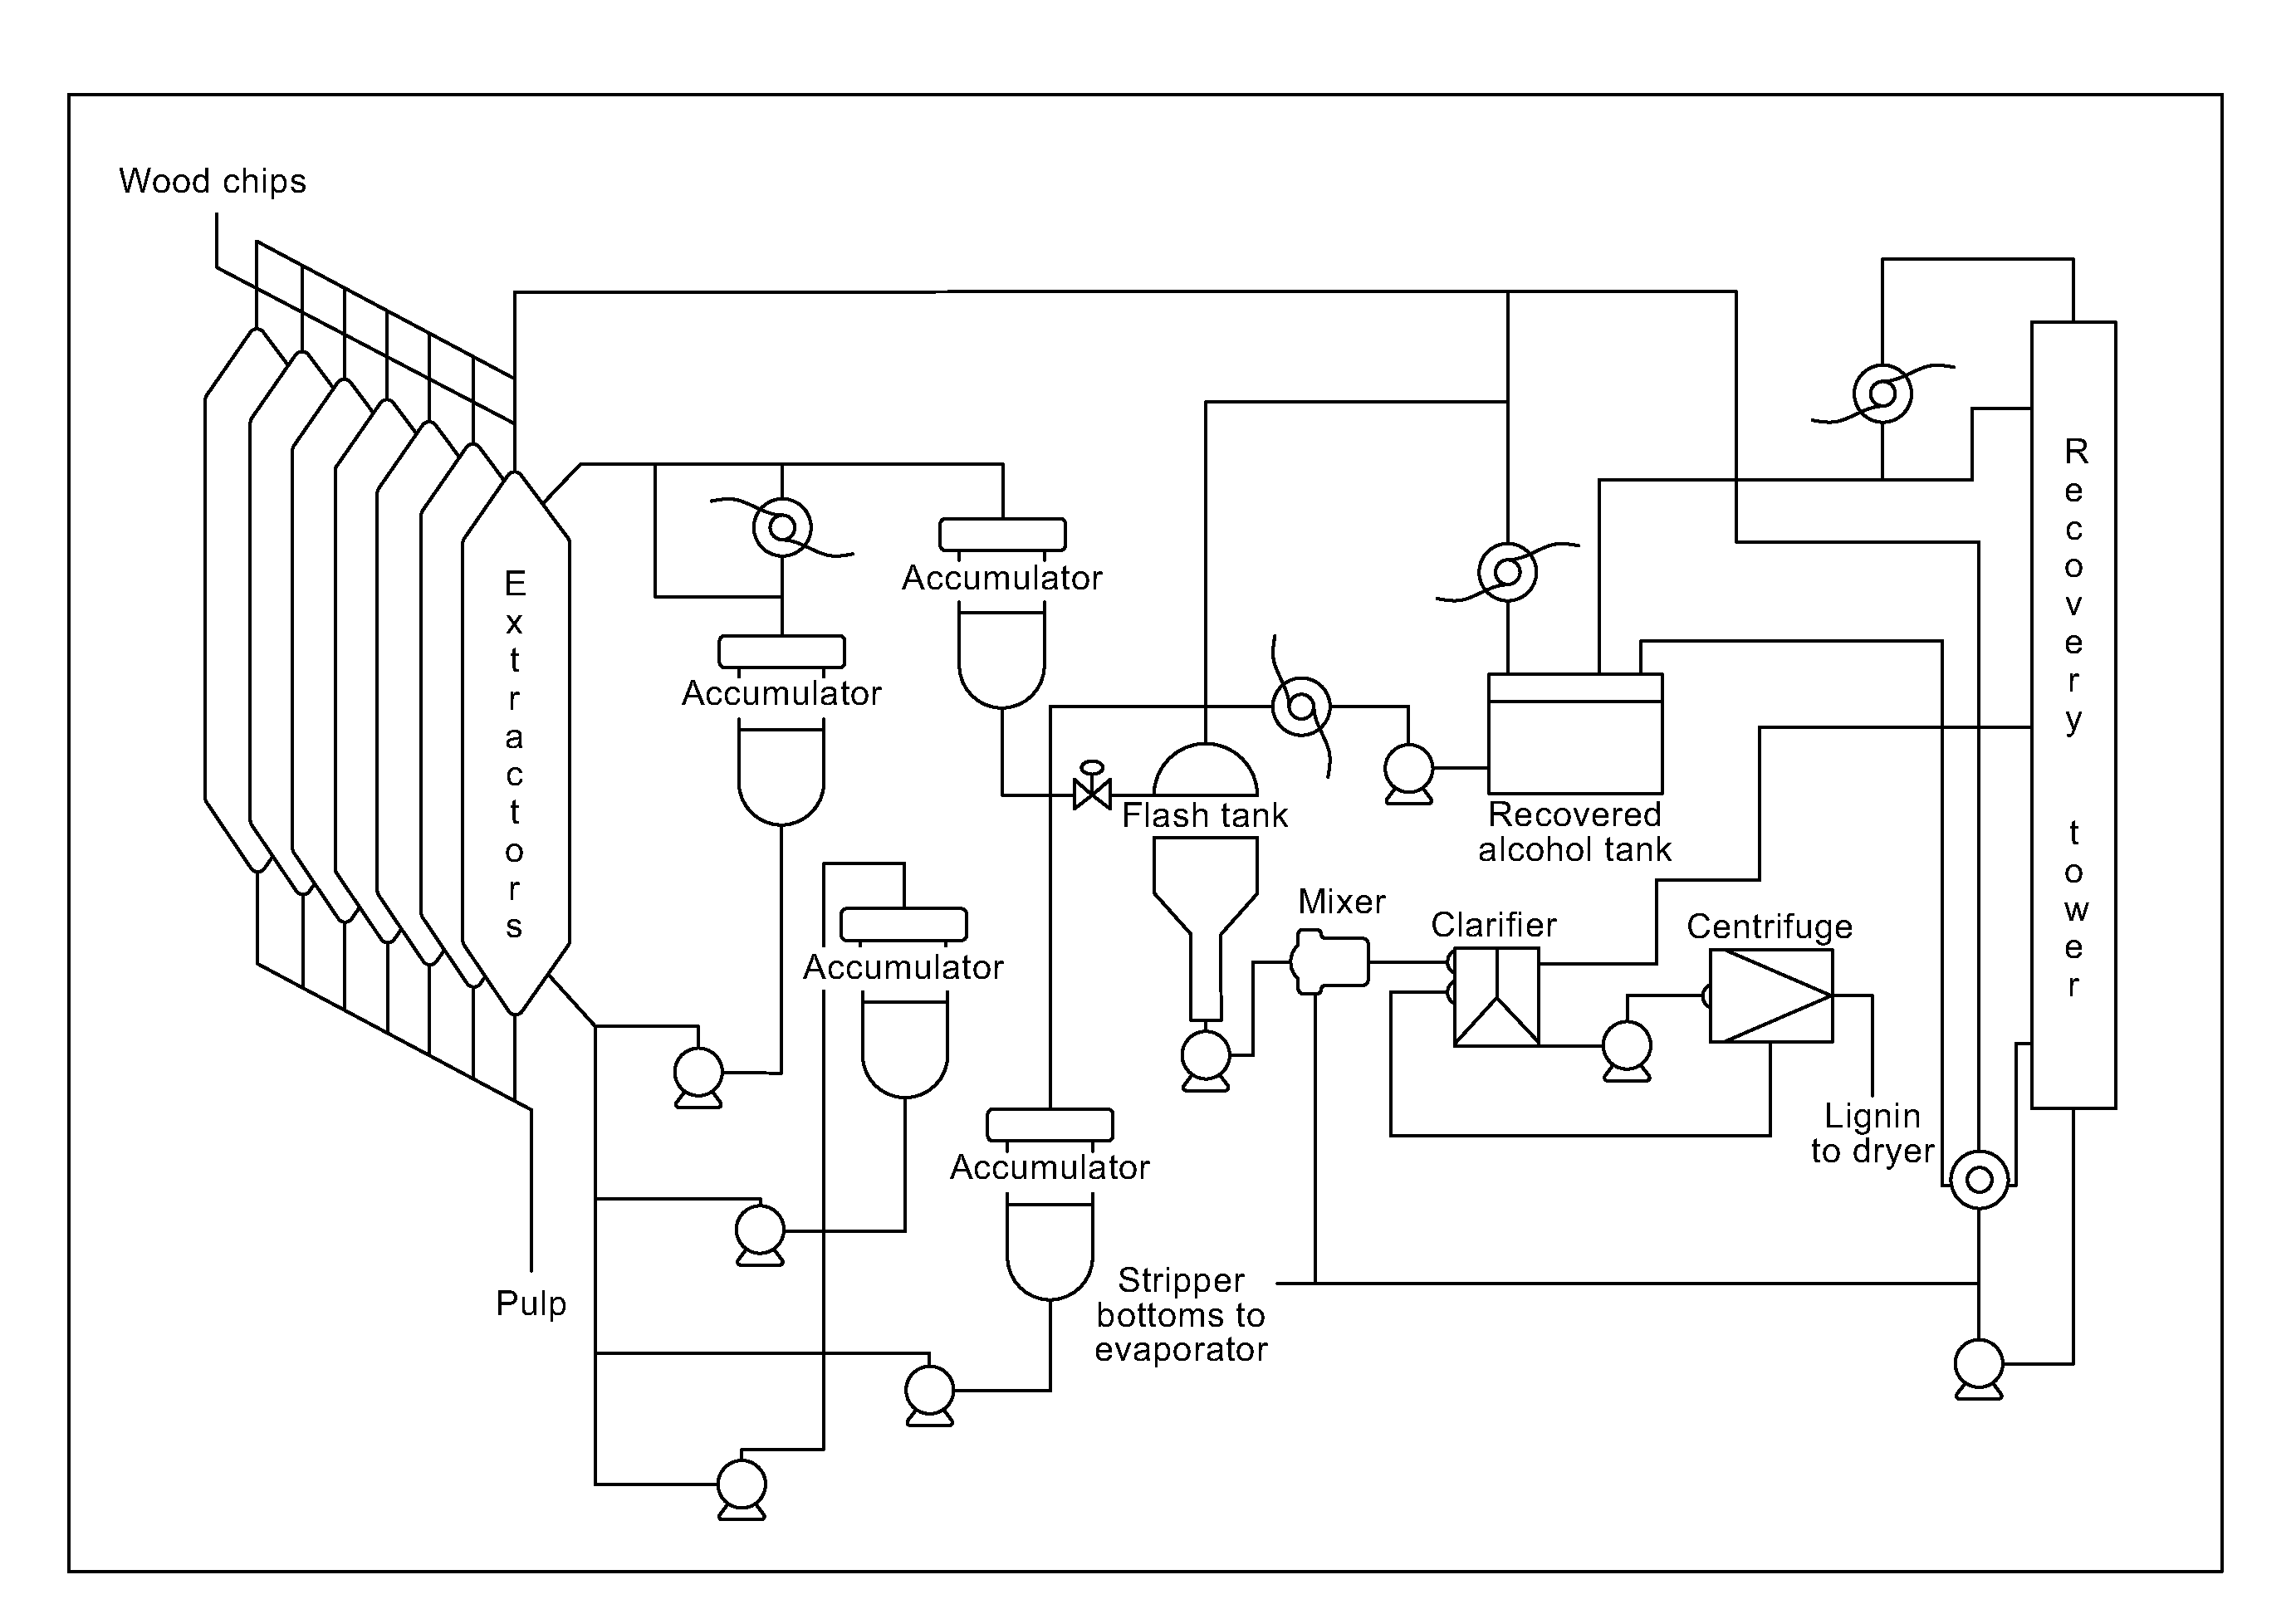 Patent Us20130172628 Organosolv Process Google Patents Accumulator Tank Schematic Drawing